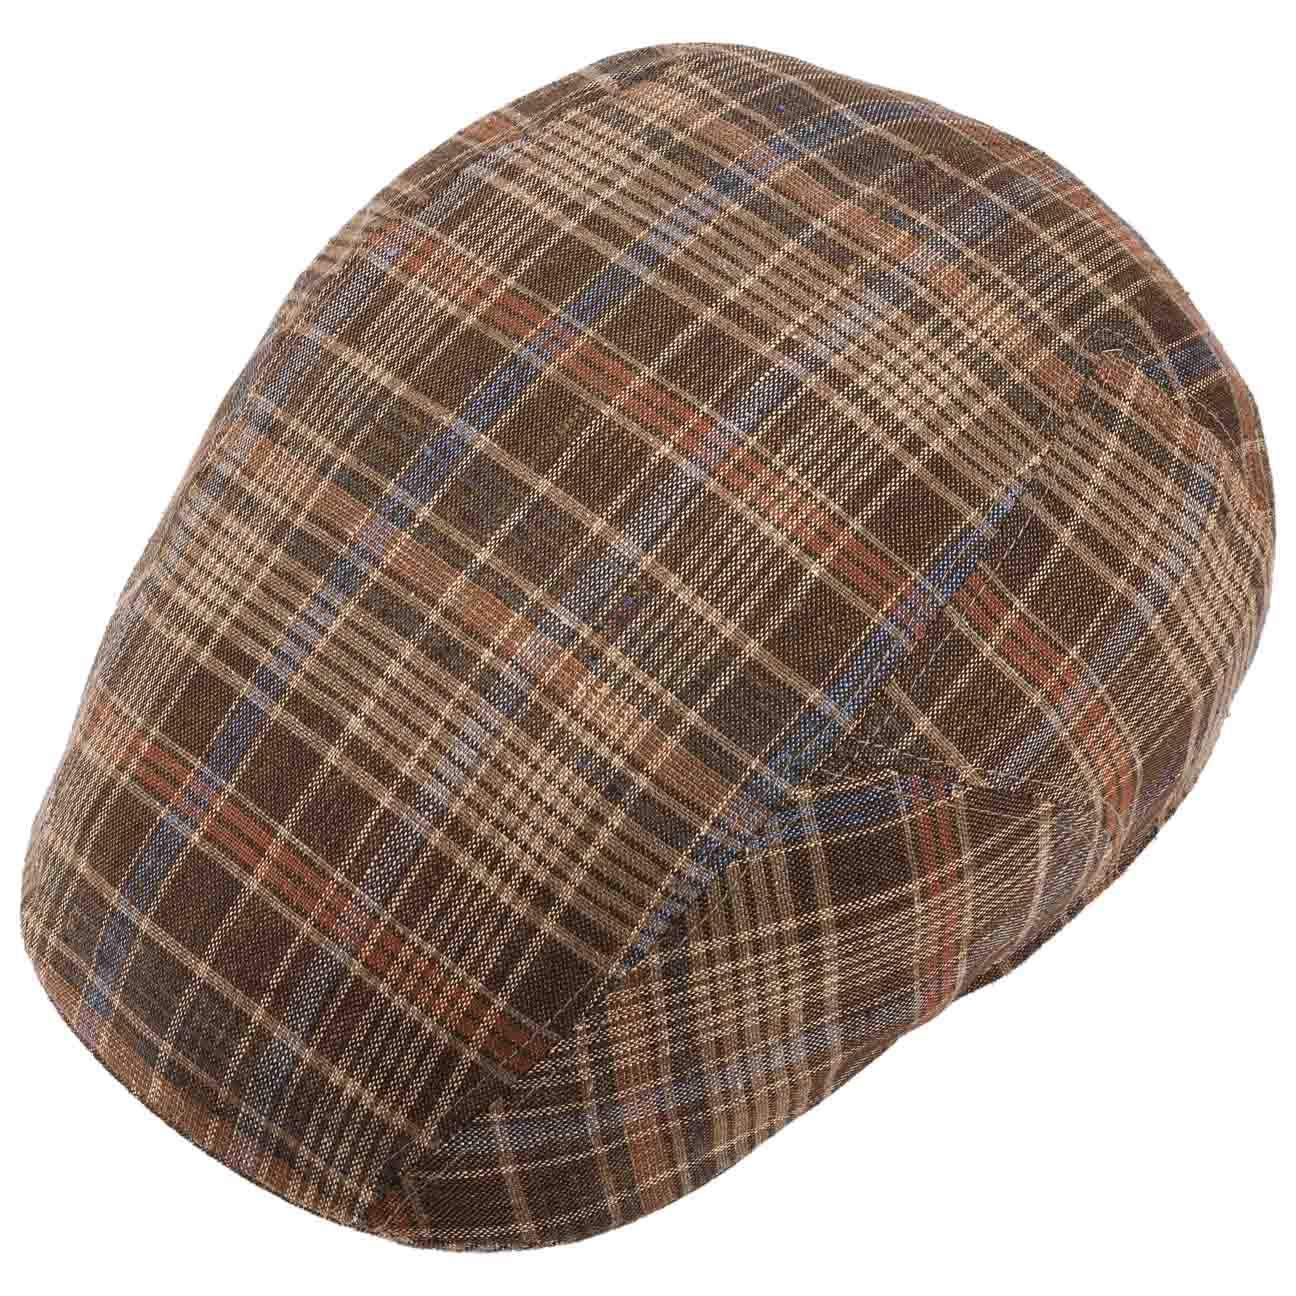 Futter, Stetson Texas Grenville Check Flatcap Schirmm/ütze Schieberm/ütze Baumwollcap Leinencap Sommercap Herren Made in The EU mit Schirm